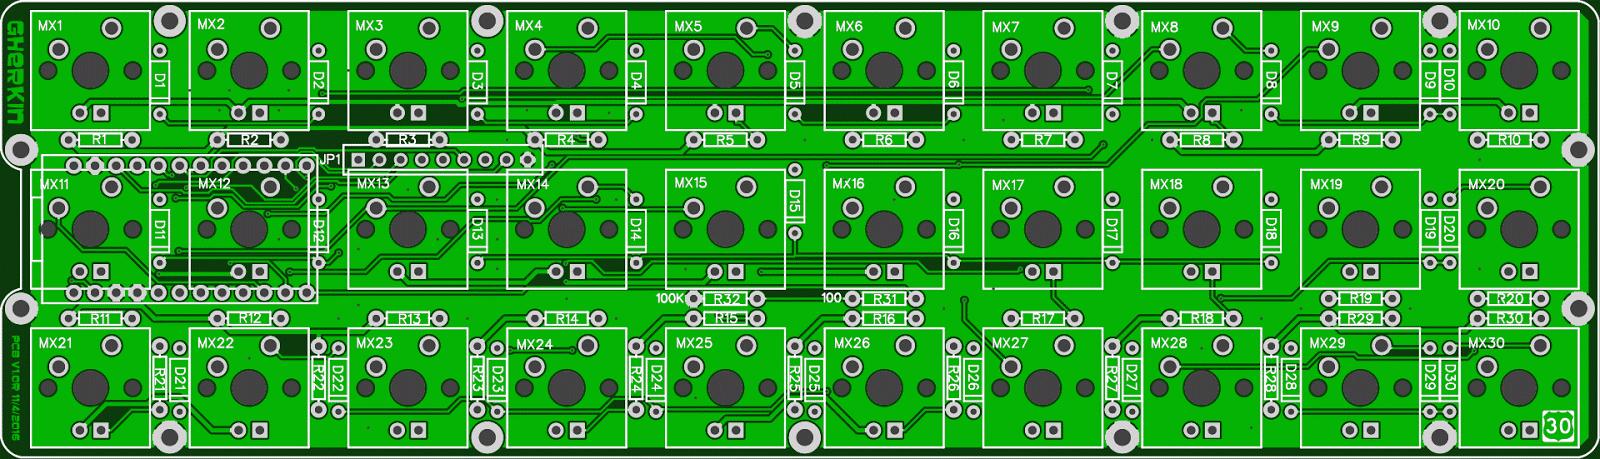 mechanical keyboard wiring diagram for s plan heating system circuit schema online 40 keyboards gherkin board